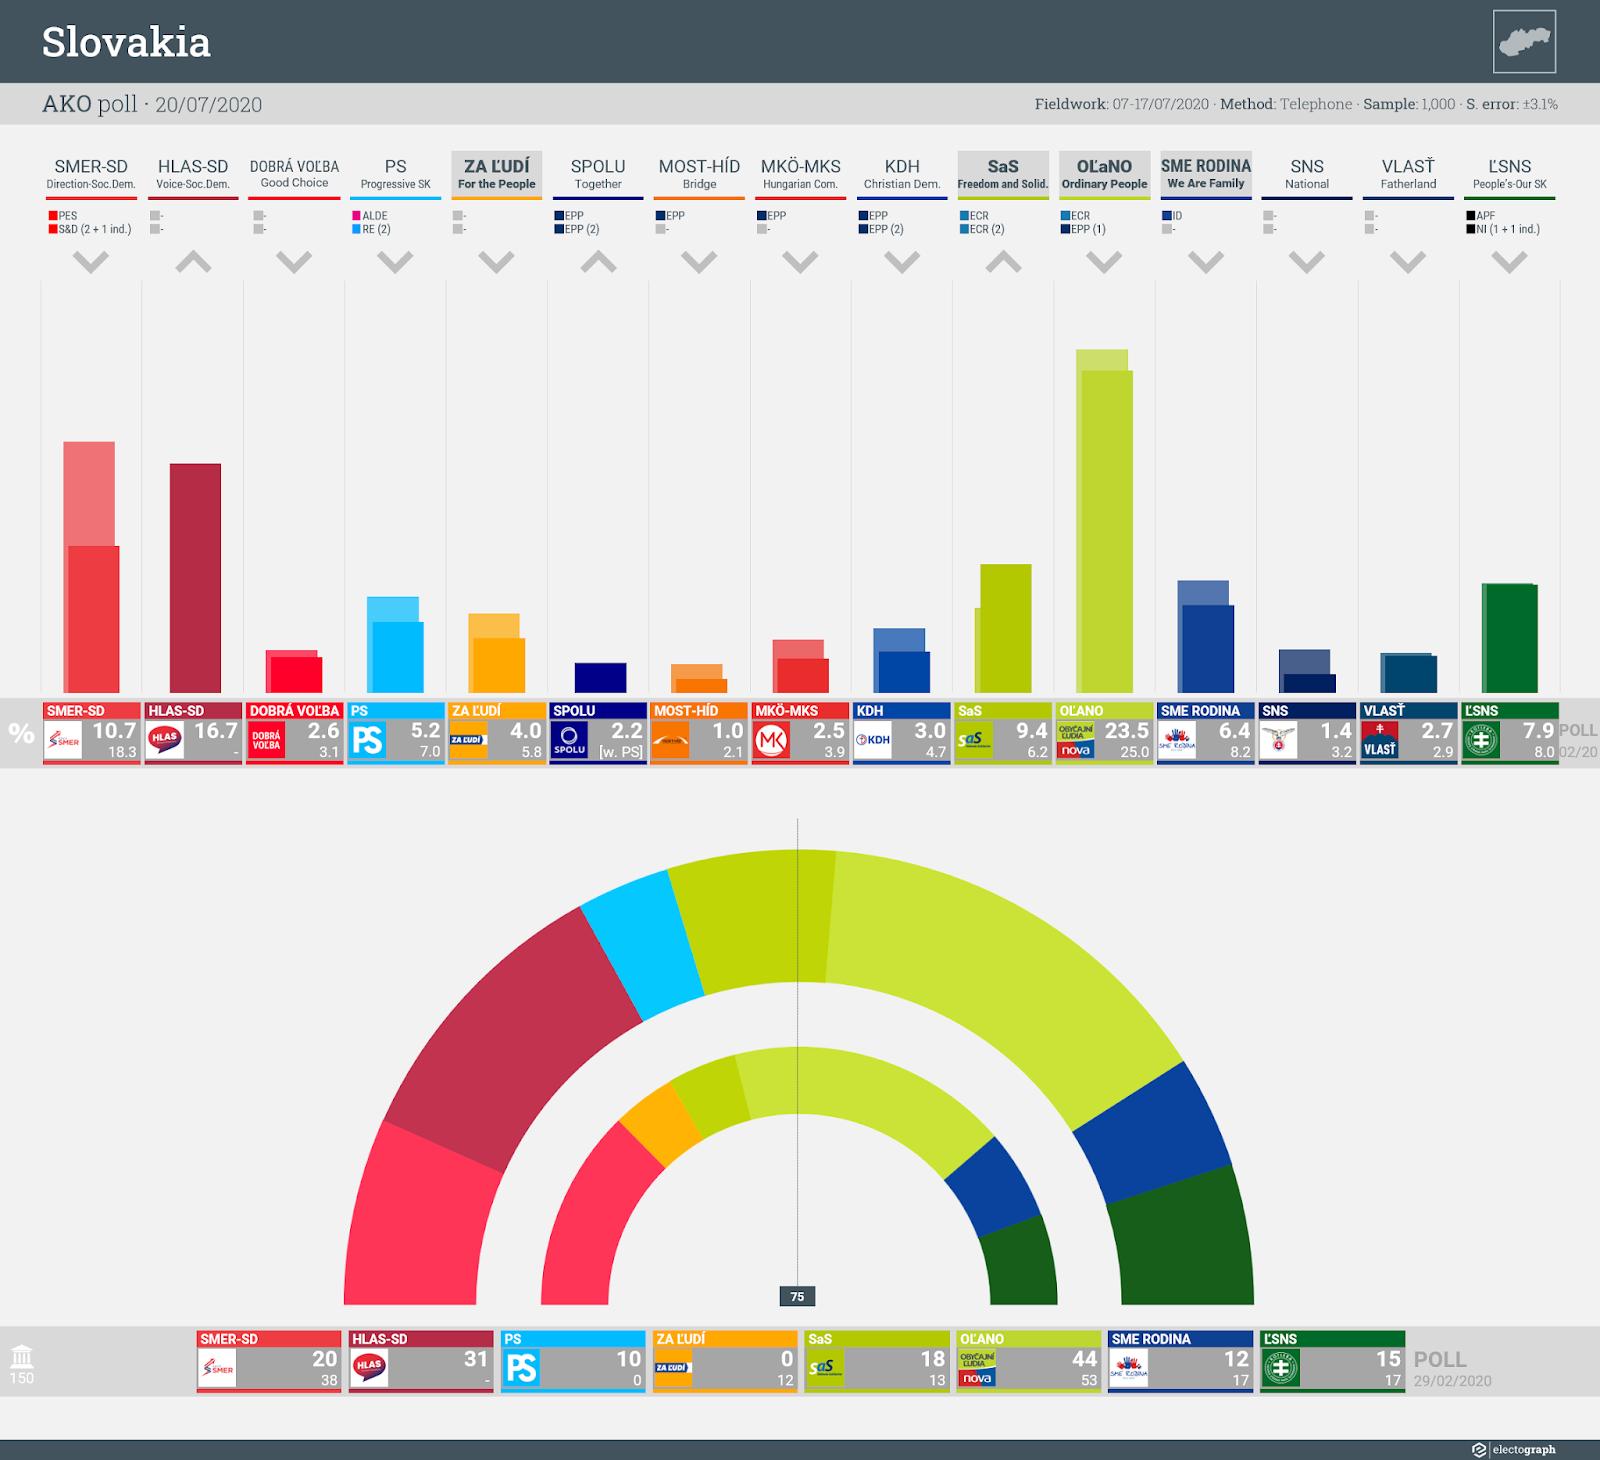 SLOVAKIA: AKO poll chart, 20 July 2020